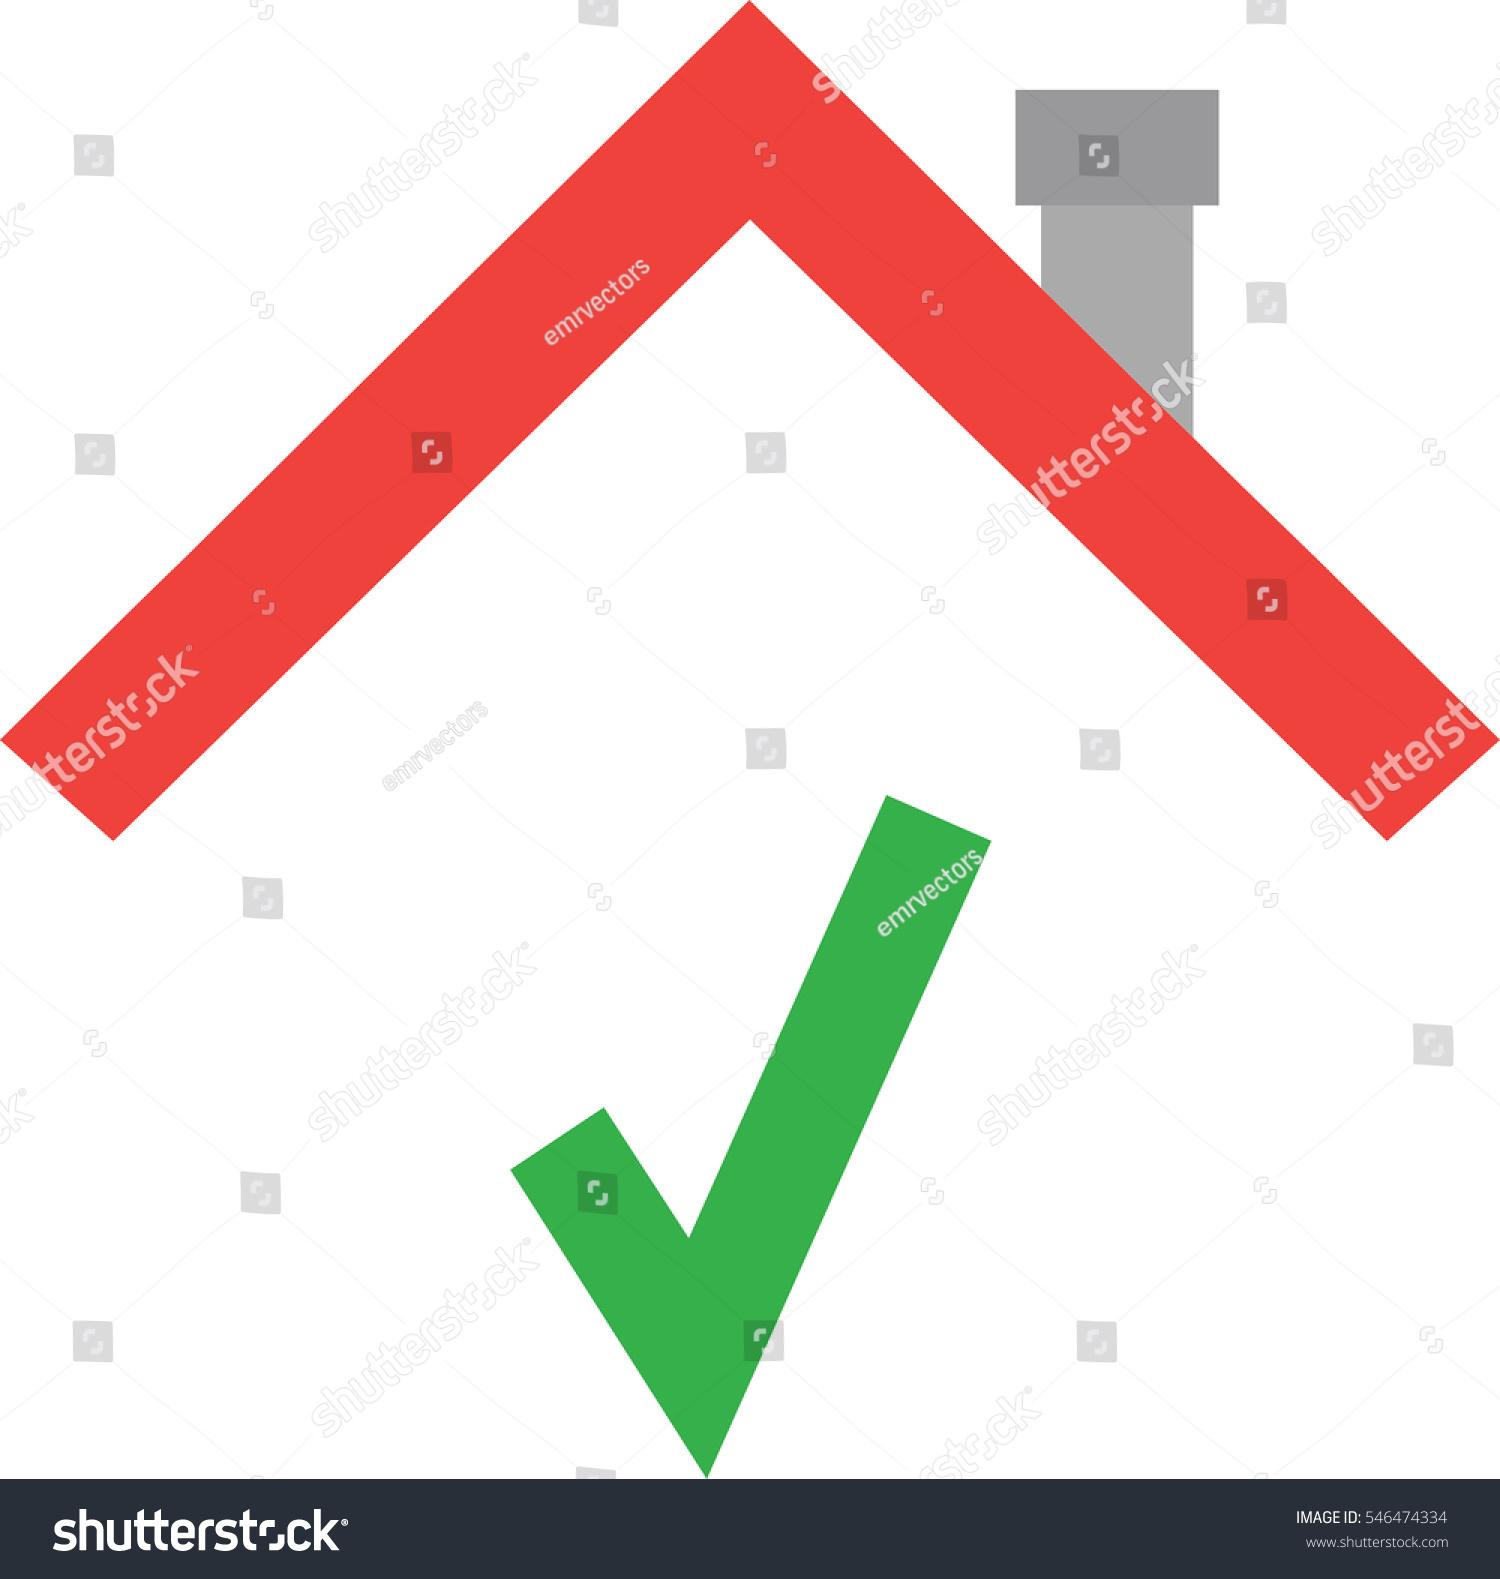 Checkmark symbol in word choice image symbol and sign ideas vector green check mark symbol under stock vector 546474334 vector green check mark symbol under red buycottarizona